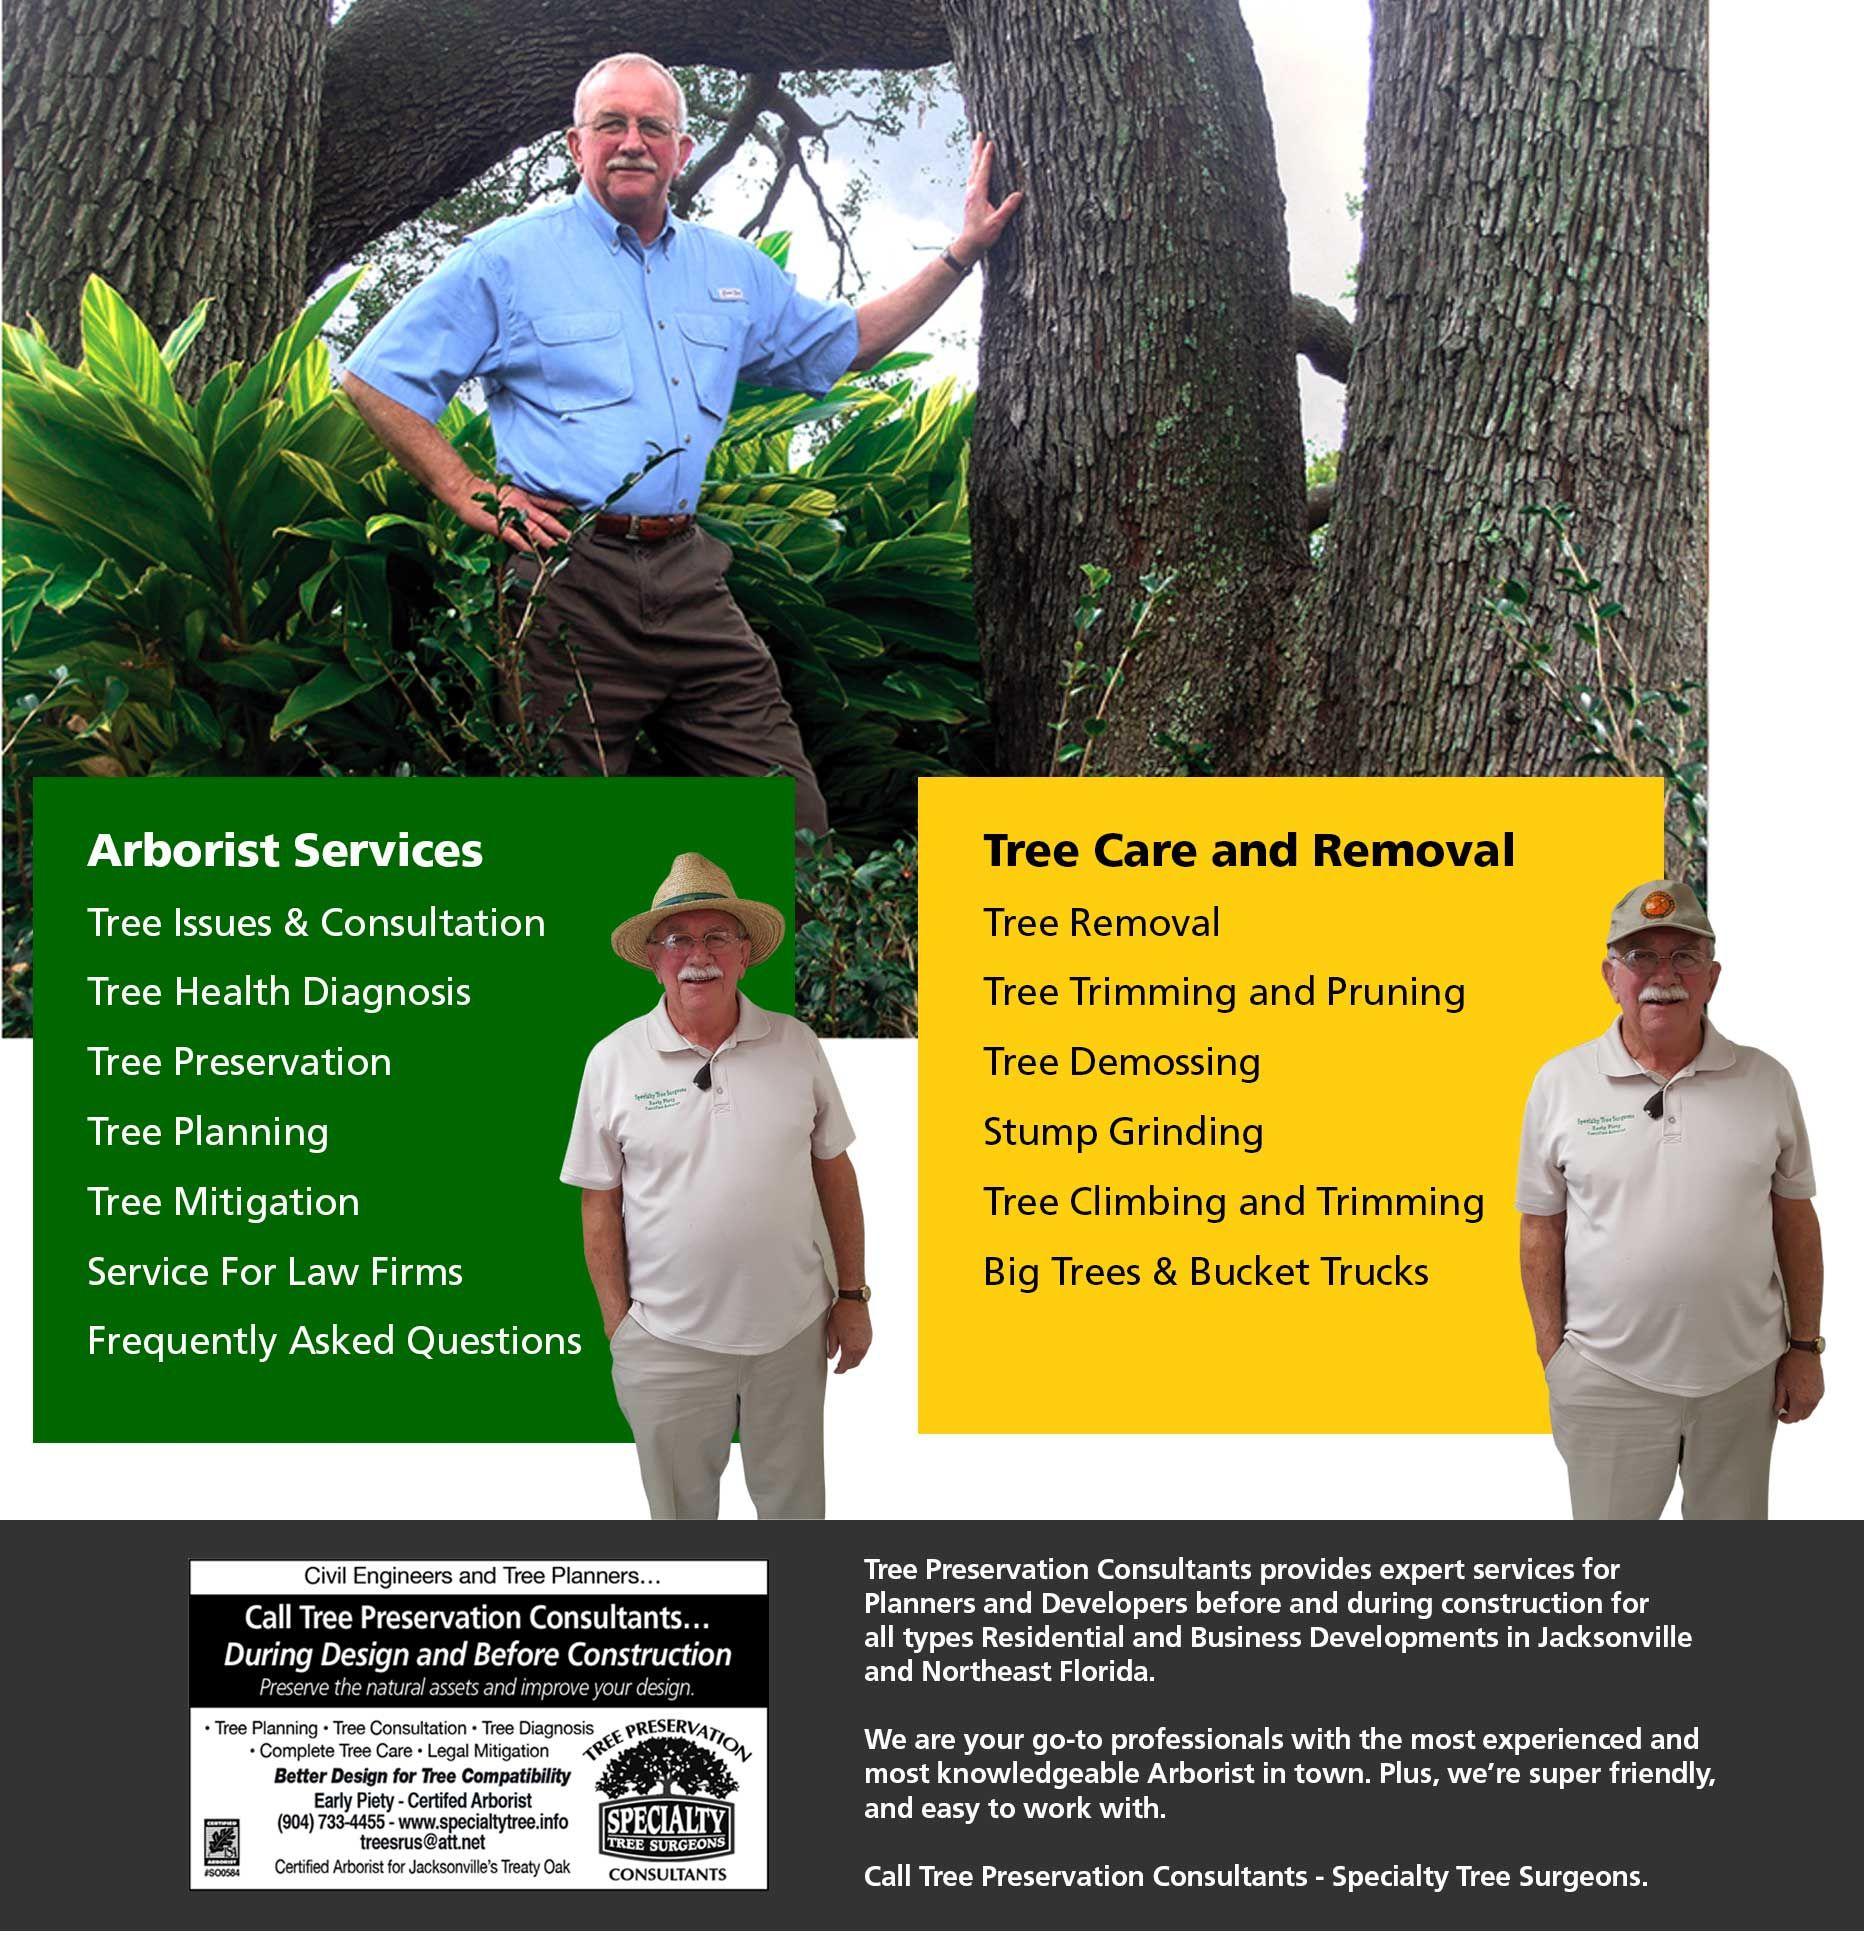 Certified Arborist Specialty Tree Surgeons, Jacksonville